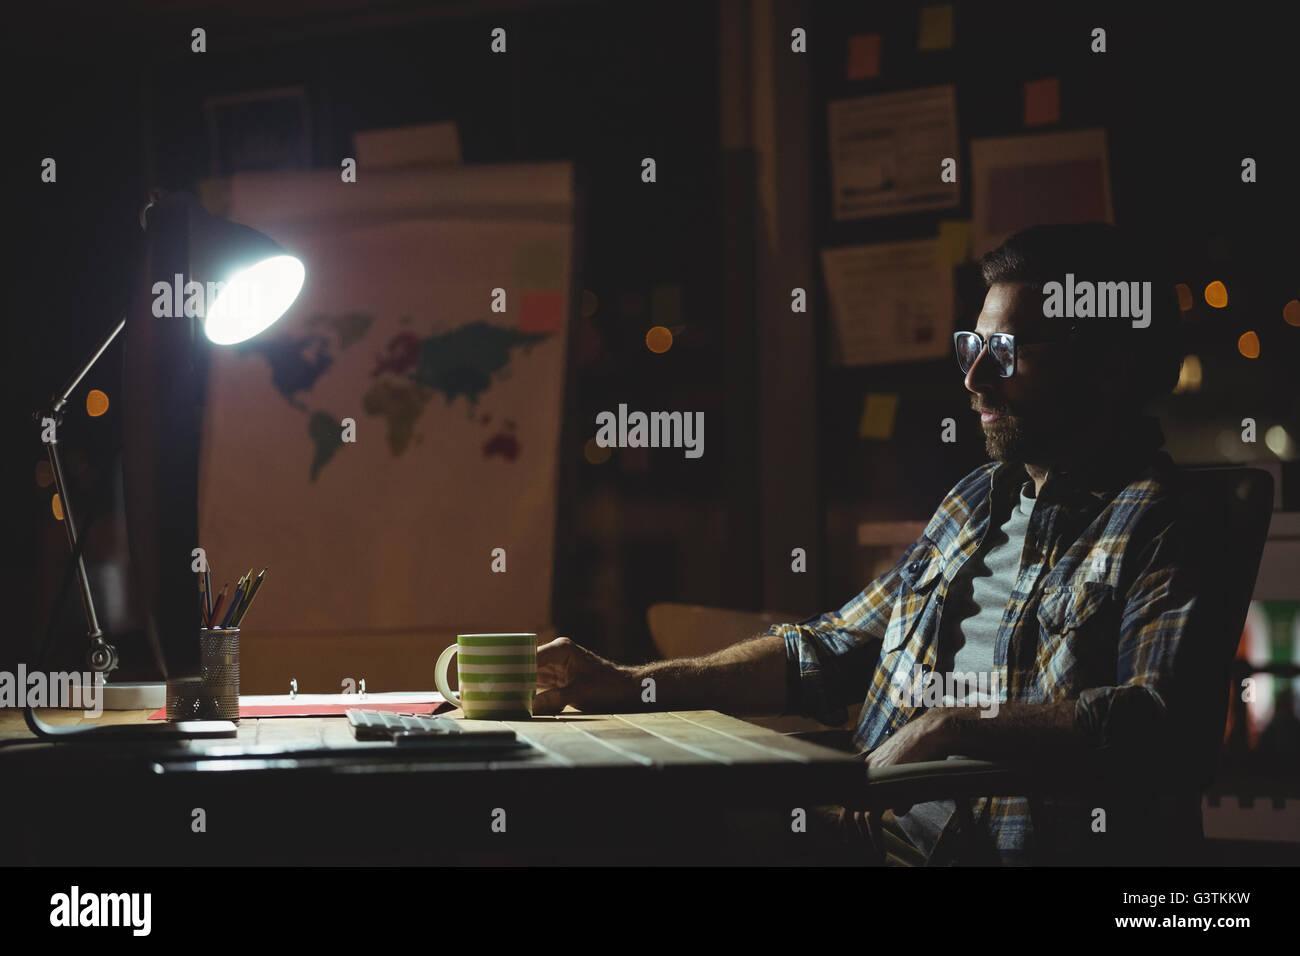 Businessman working at night - Stock Image